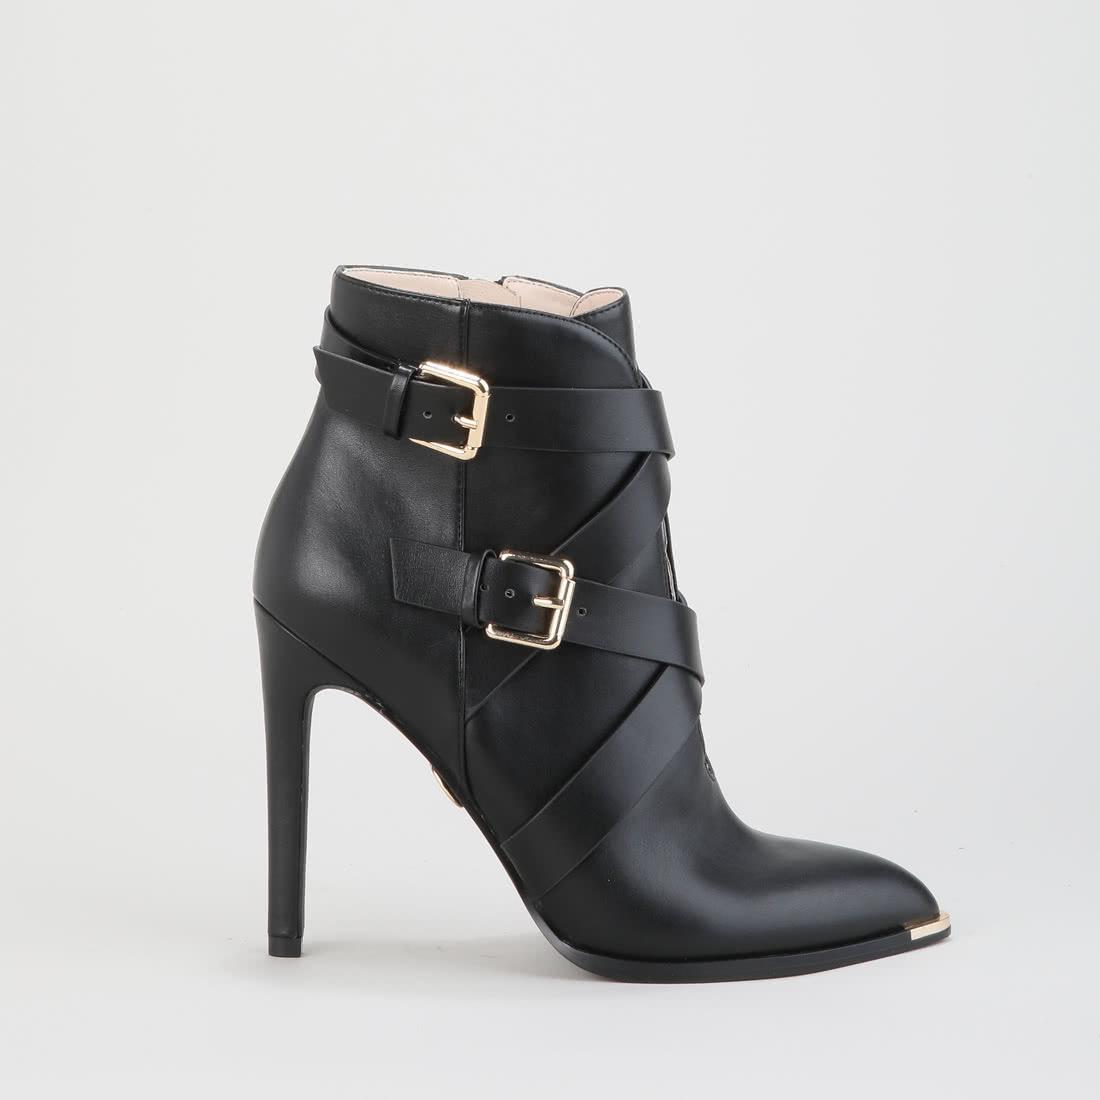 French Vanilla Ankle Boot schwarz online kaufen   BUFFALO® ec8b85cb50